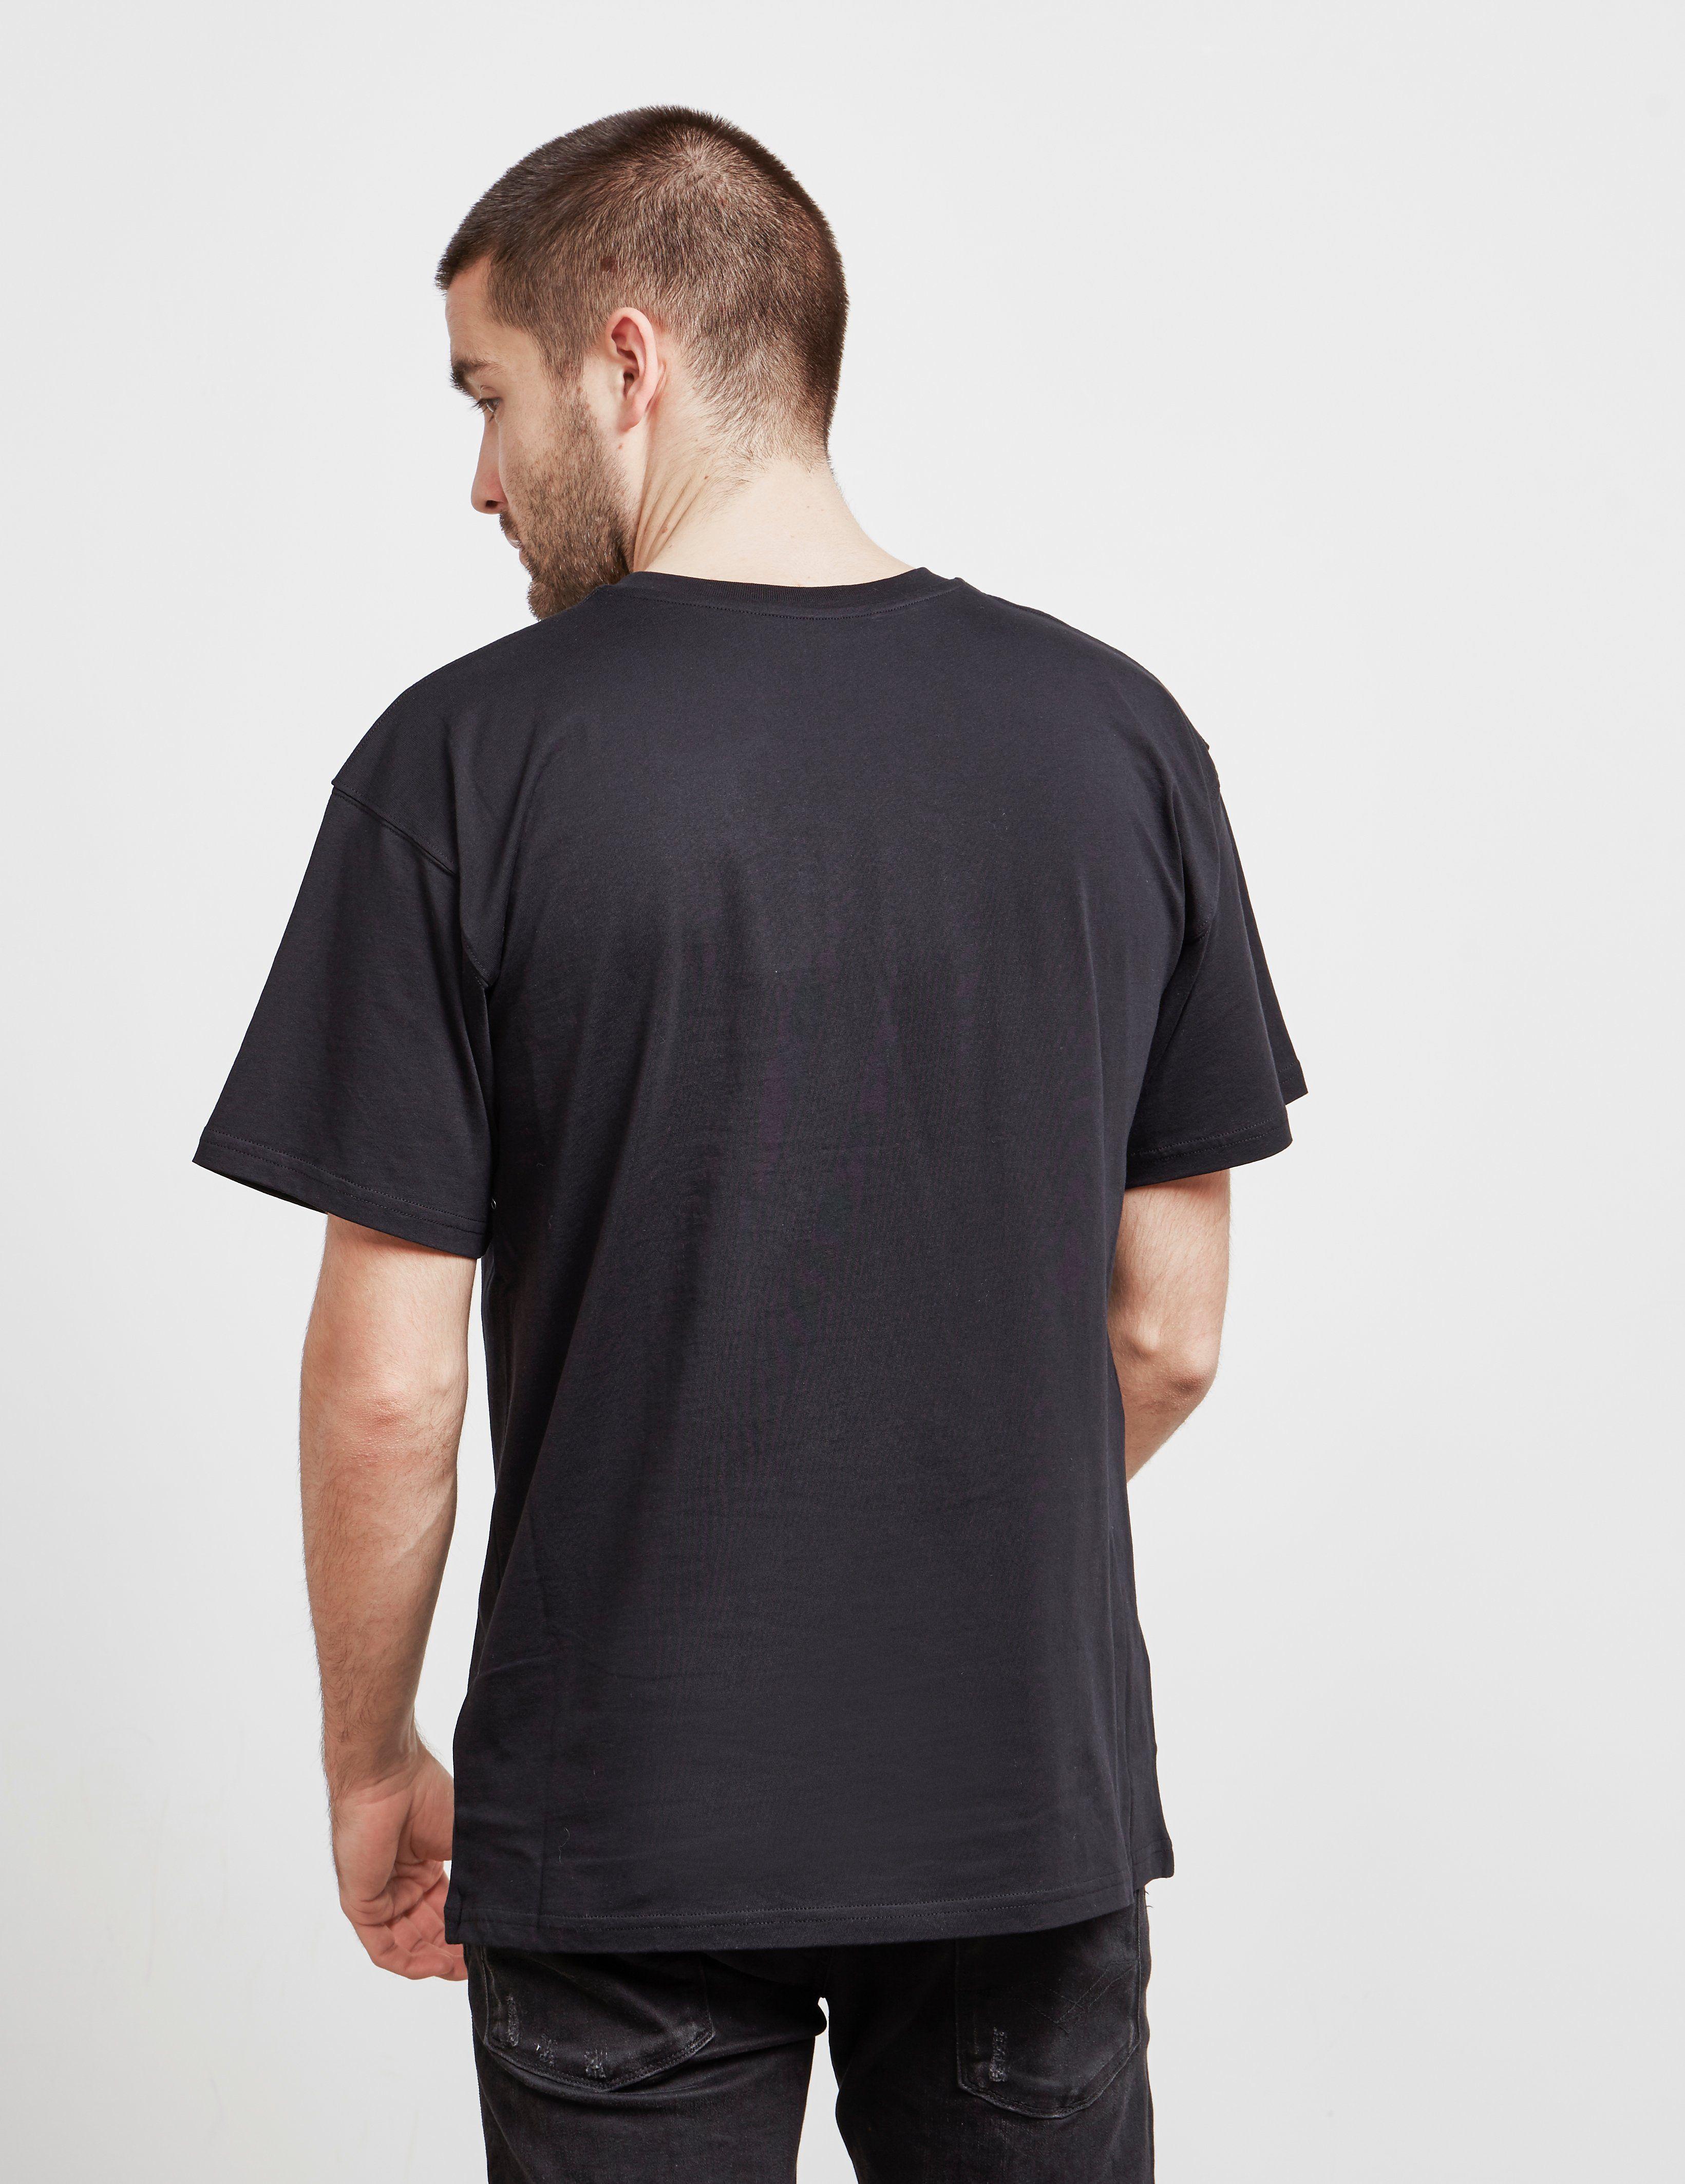 Moschino Milano Gold Short Sleeve T-Shirt